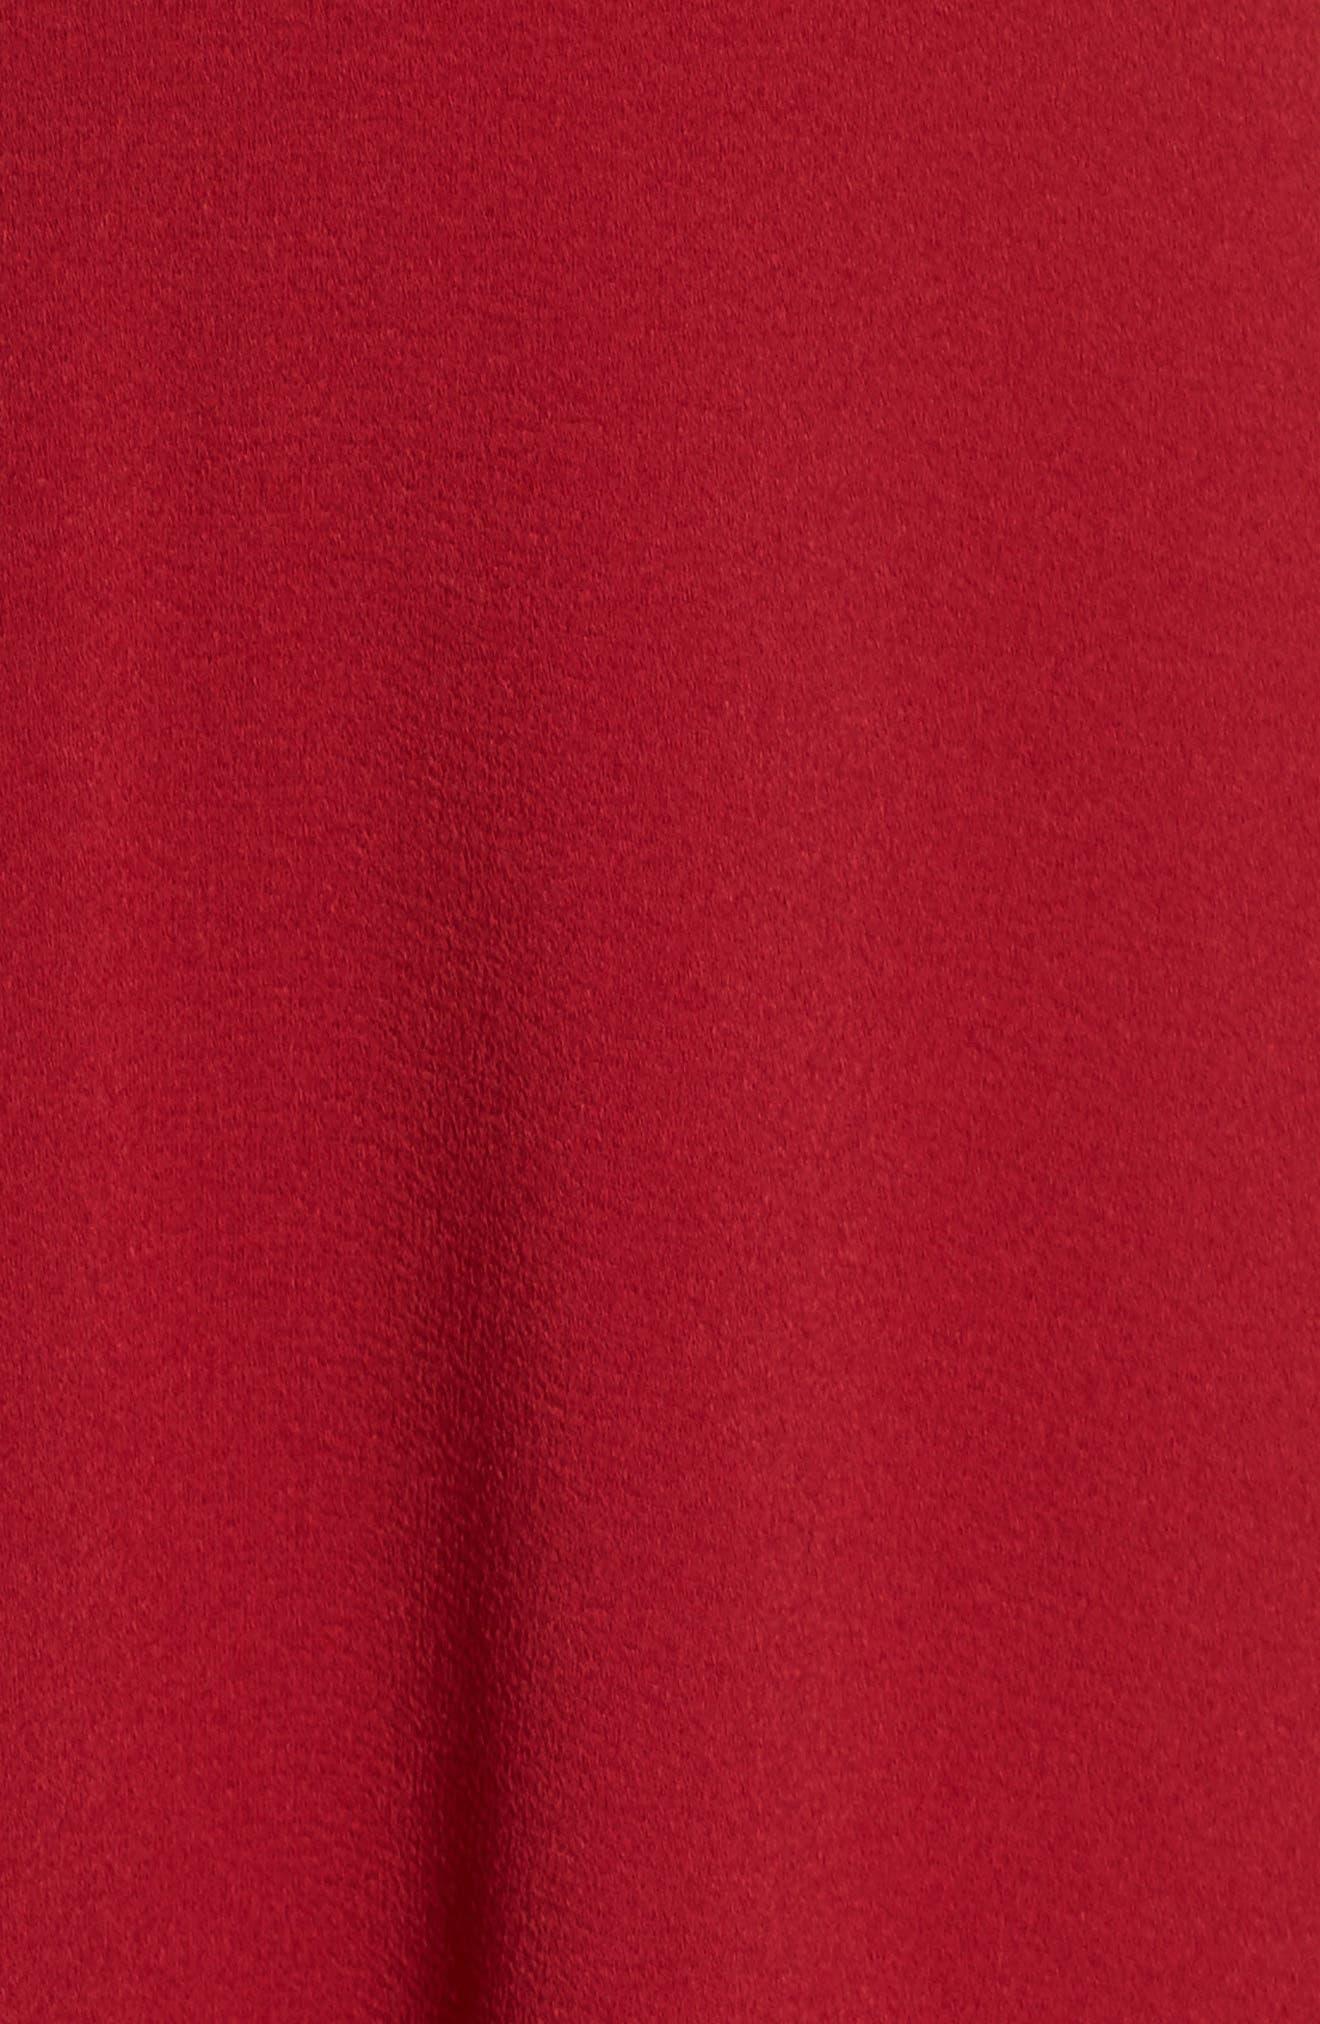 Fit & Flare Dress,                             Alternate thumbnail 5, color,                             930